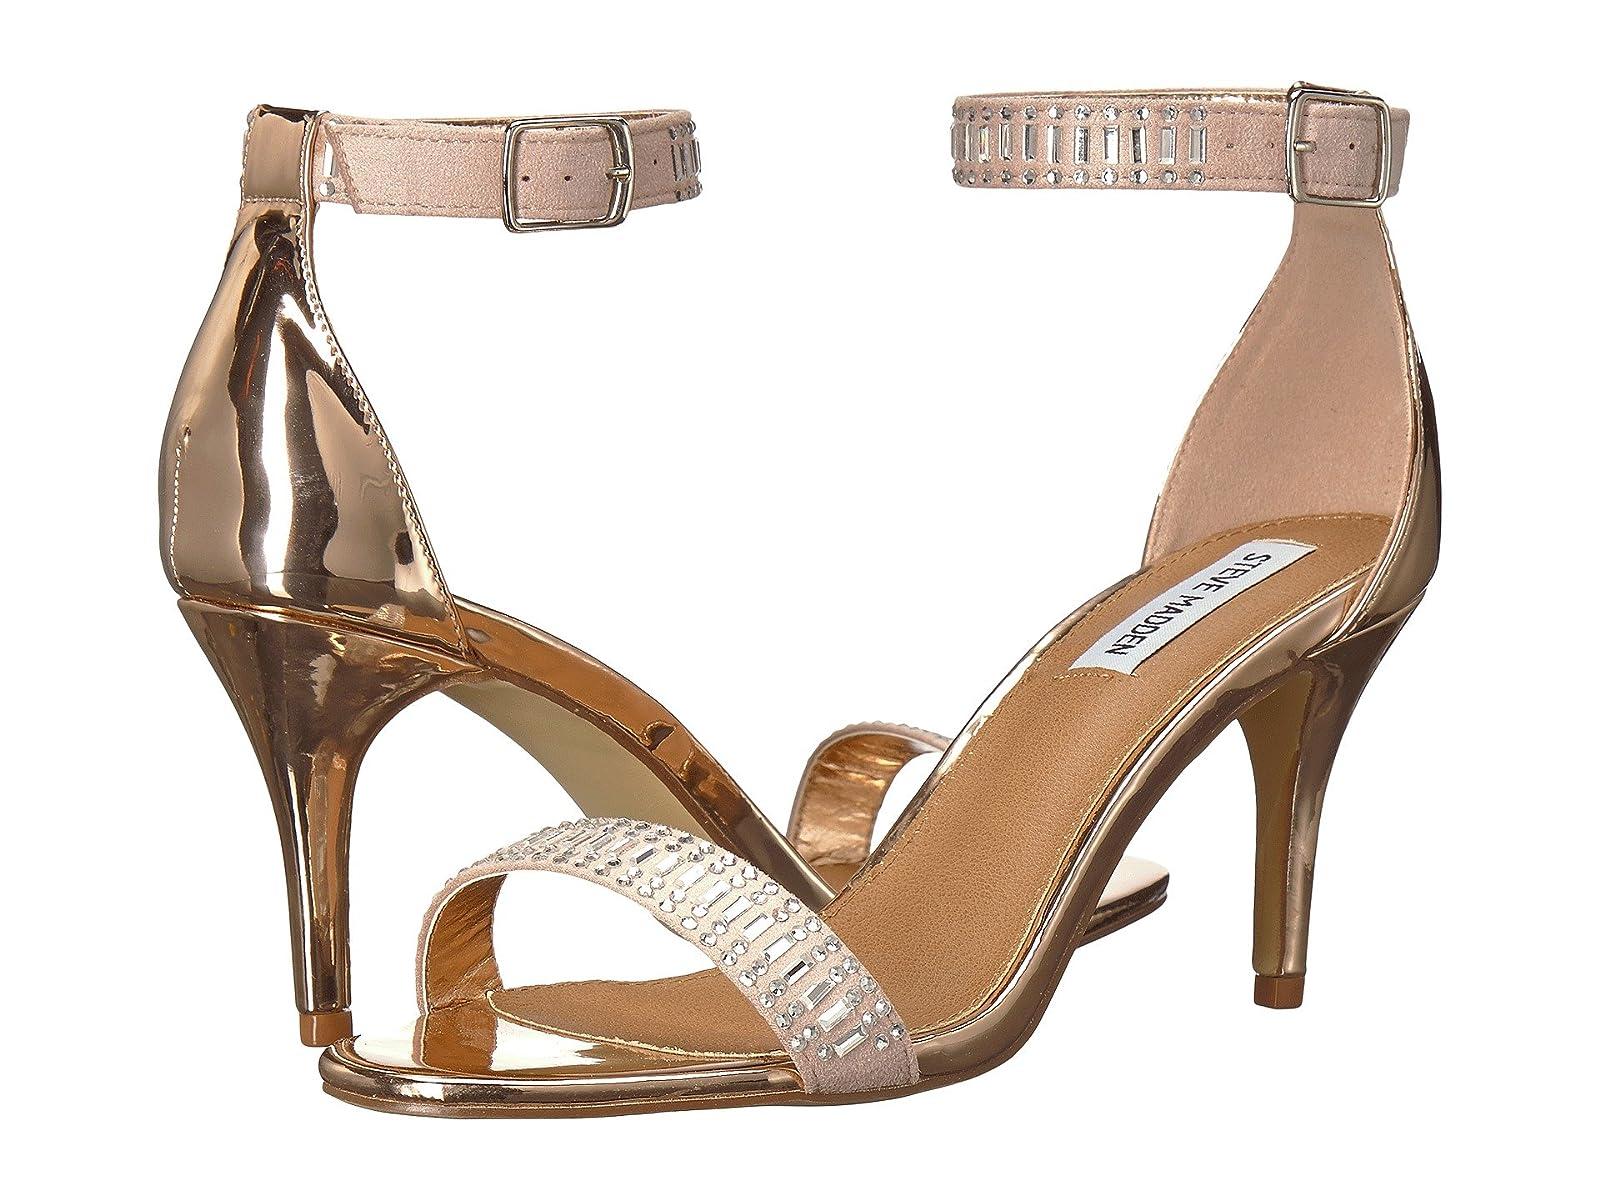 Steve Madden FlorelaCheap and distinctive eye-catching shoes